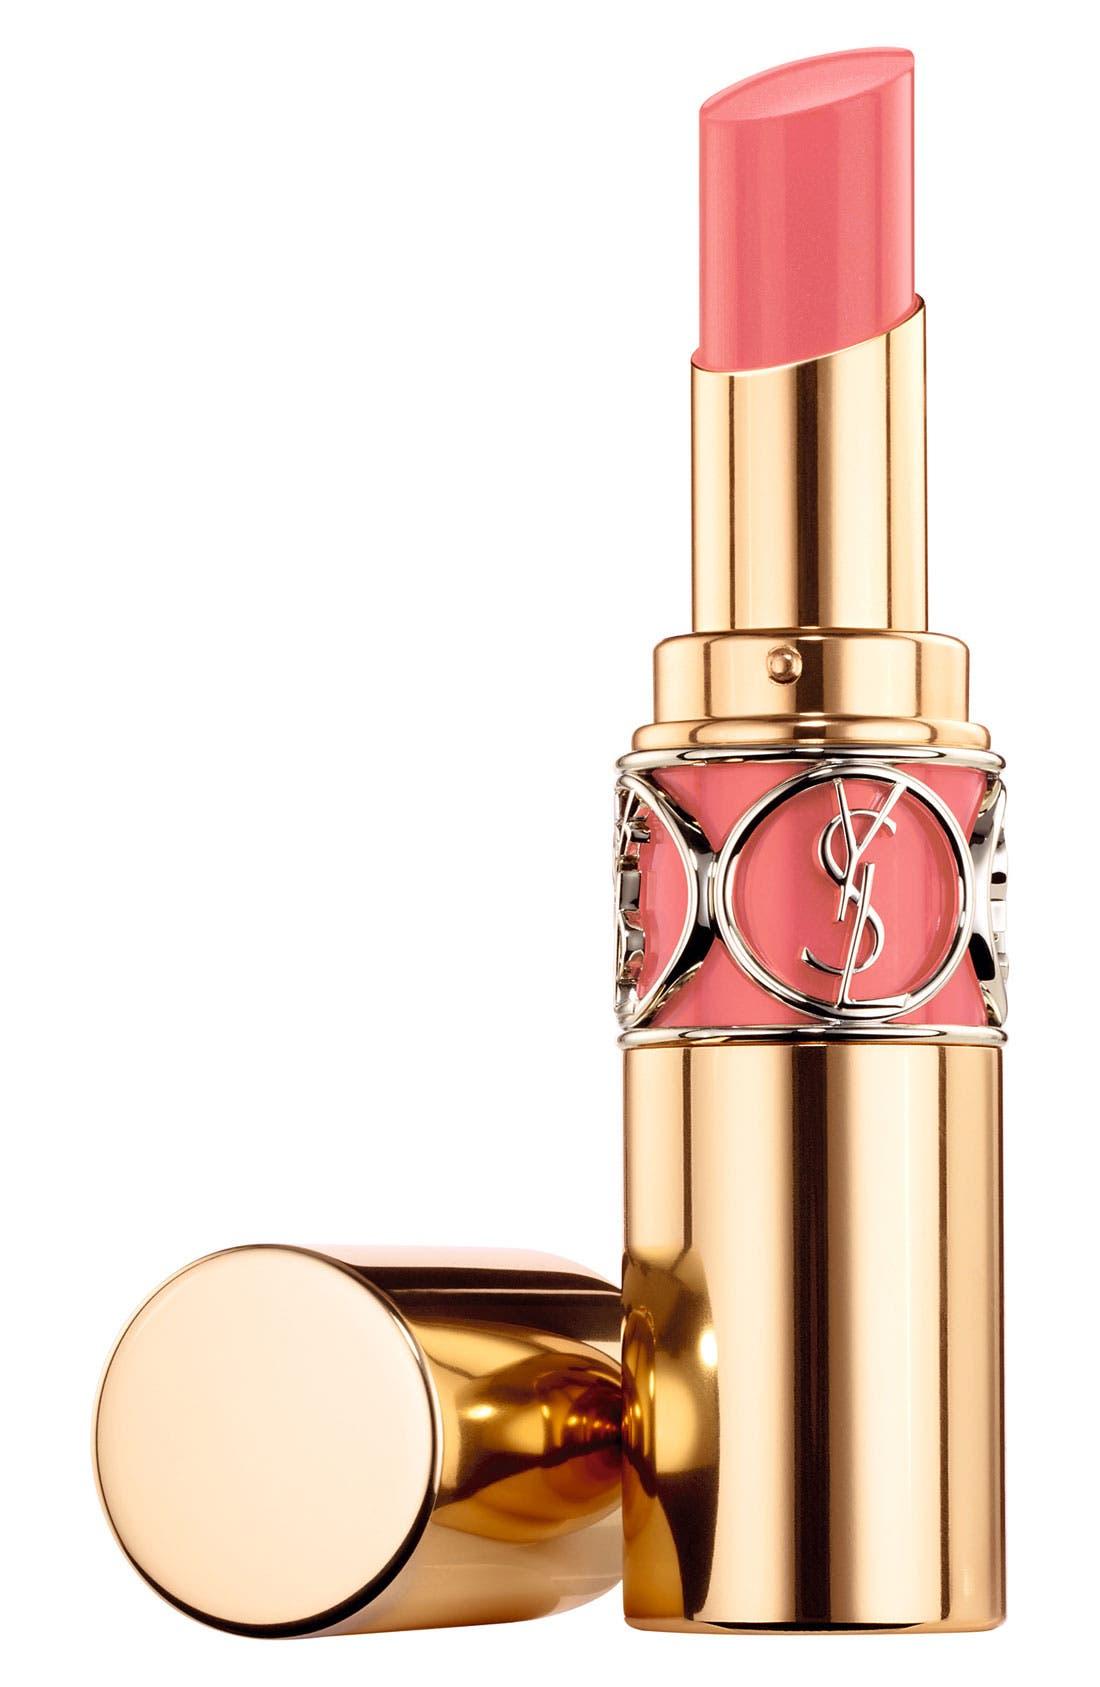 Yves Saint Laurent Rouge Volupte Shine Oil-In-Stick Lipstick - 13 Pink Babylone